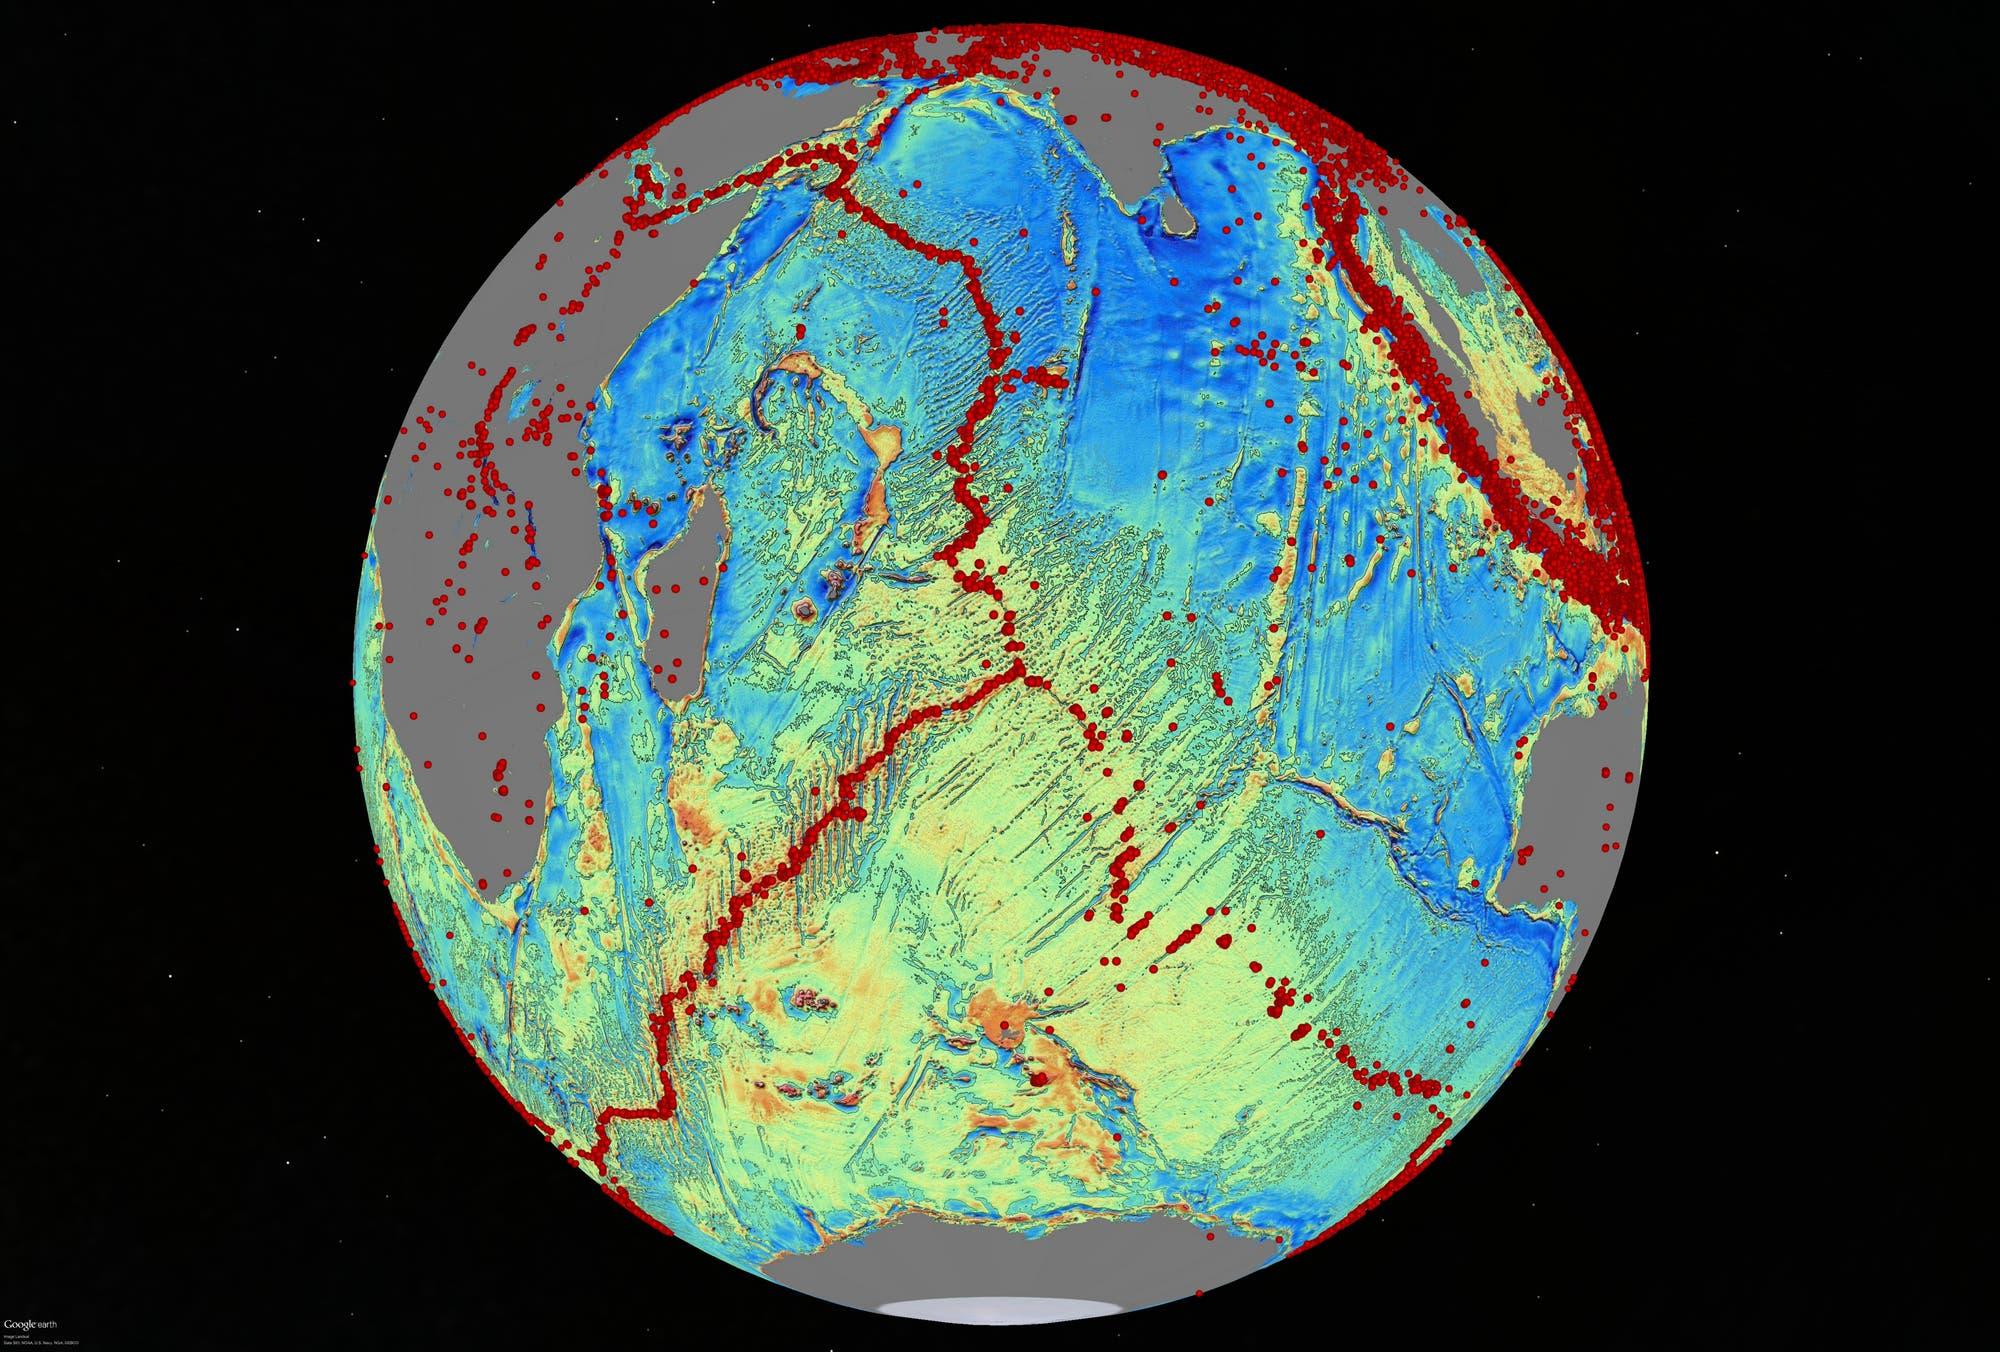 Meeresboden im Indischen Ozean